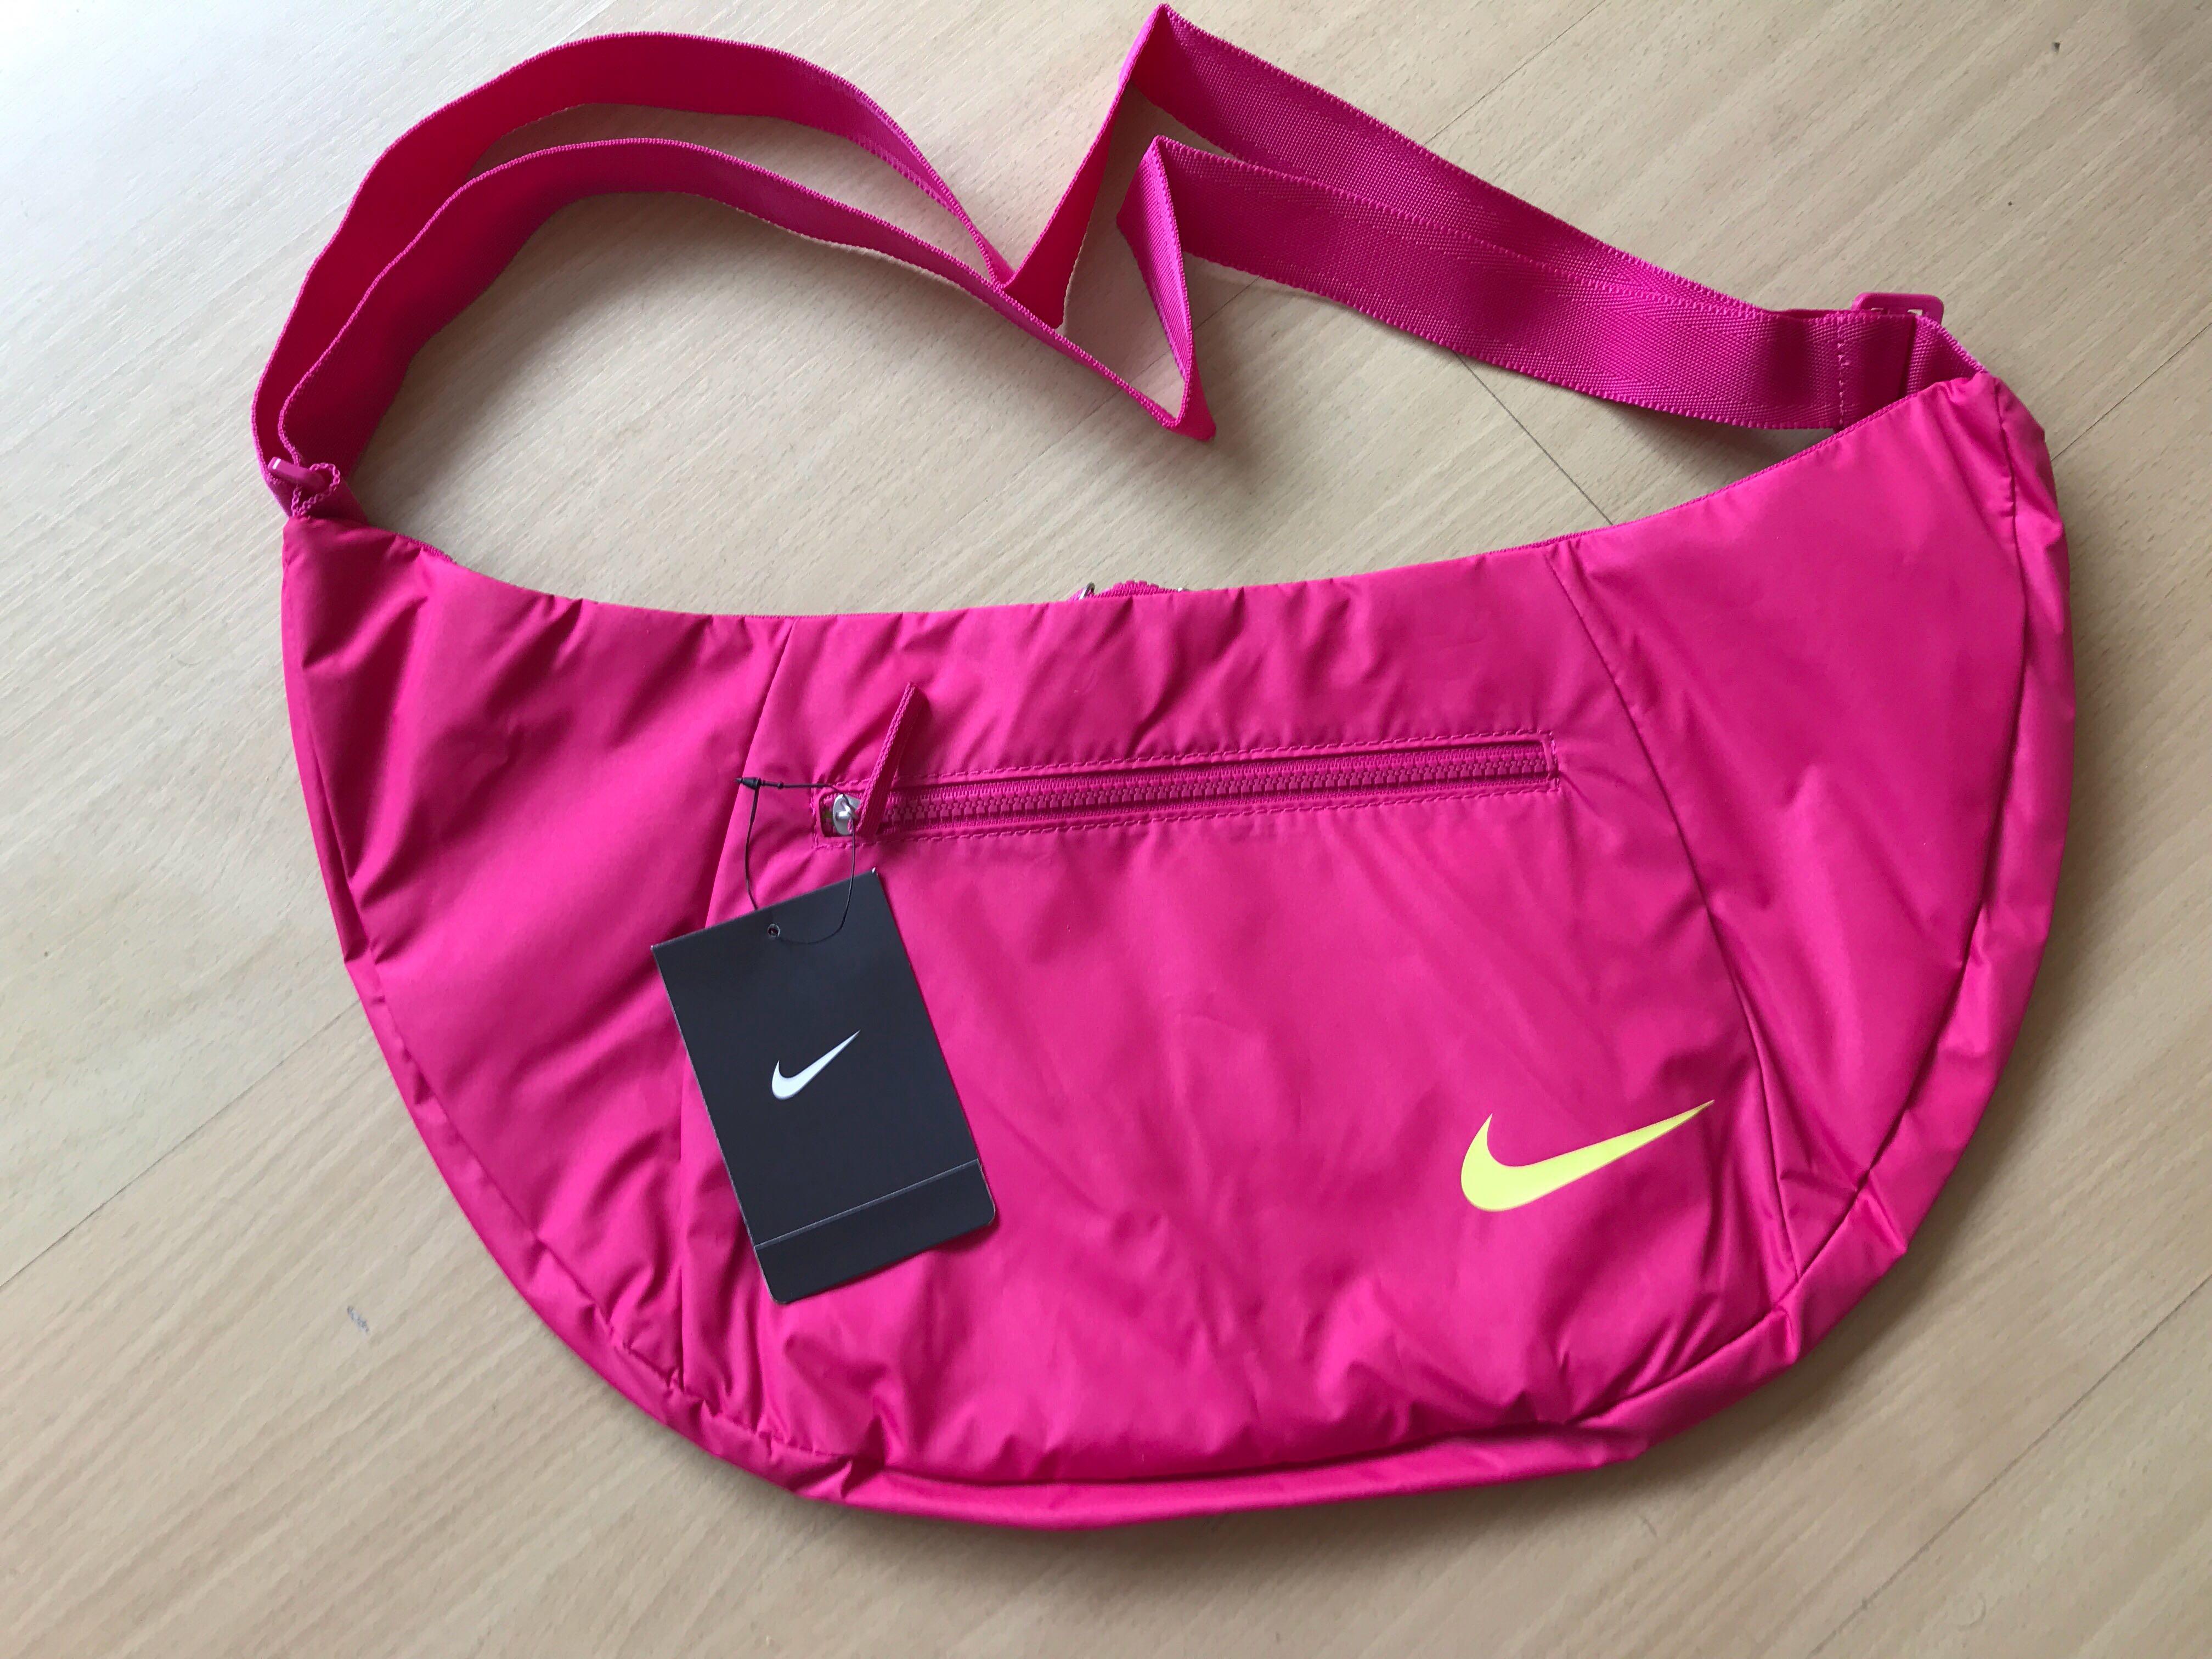 4998ae48f9 Home · Women s Fashion · Bags   Wallets · Sling Bags. photo photo photo